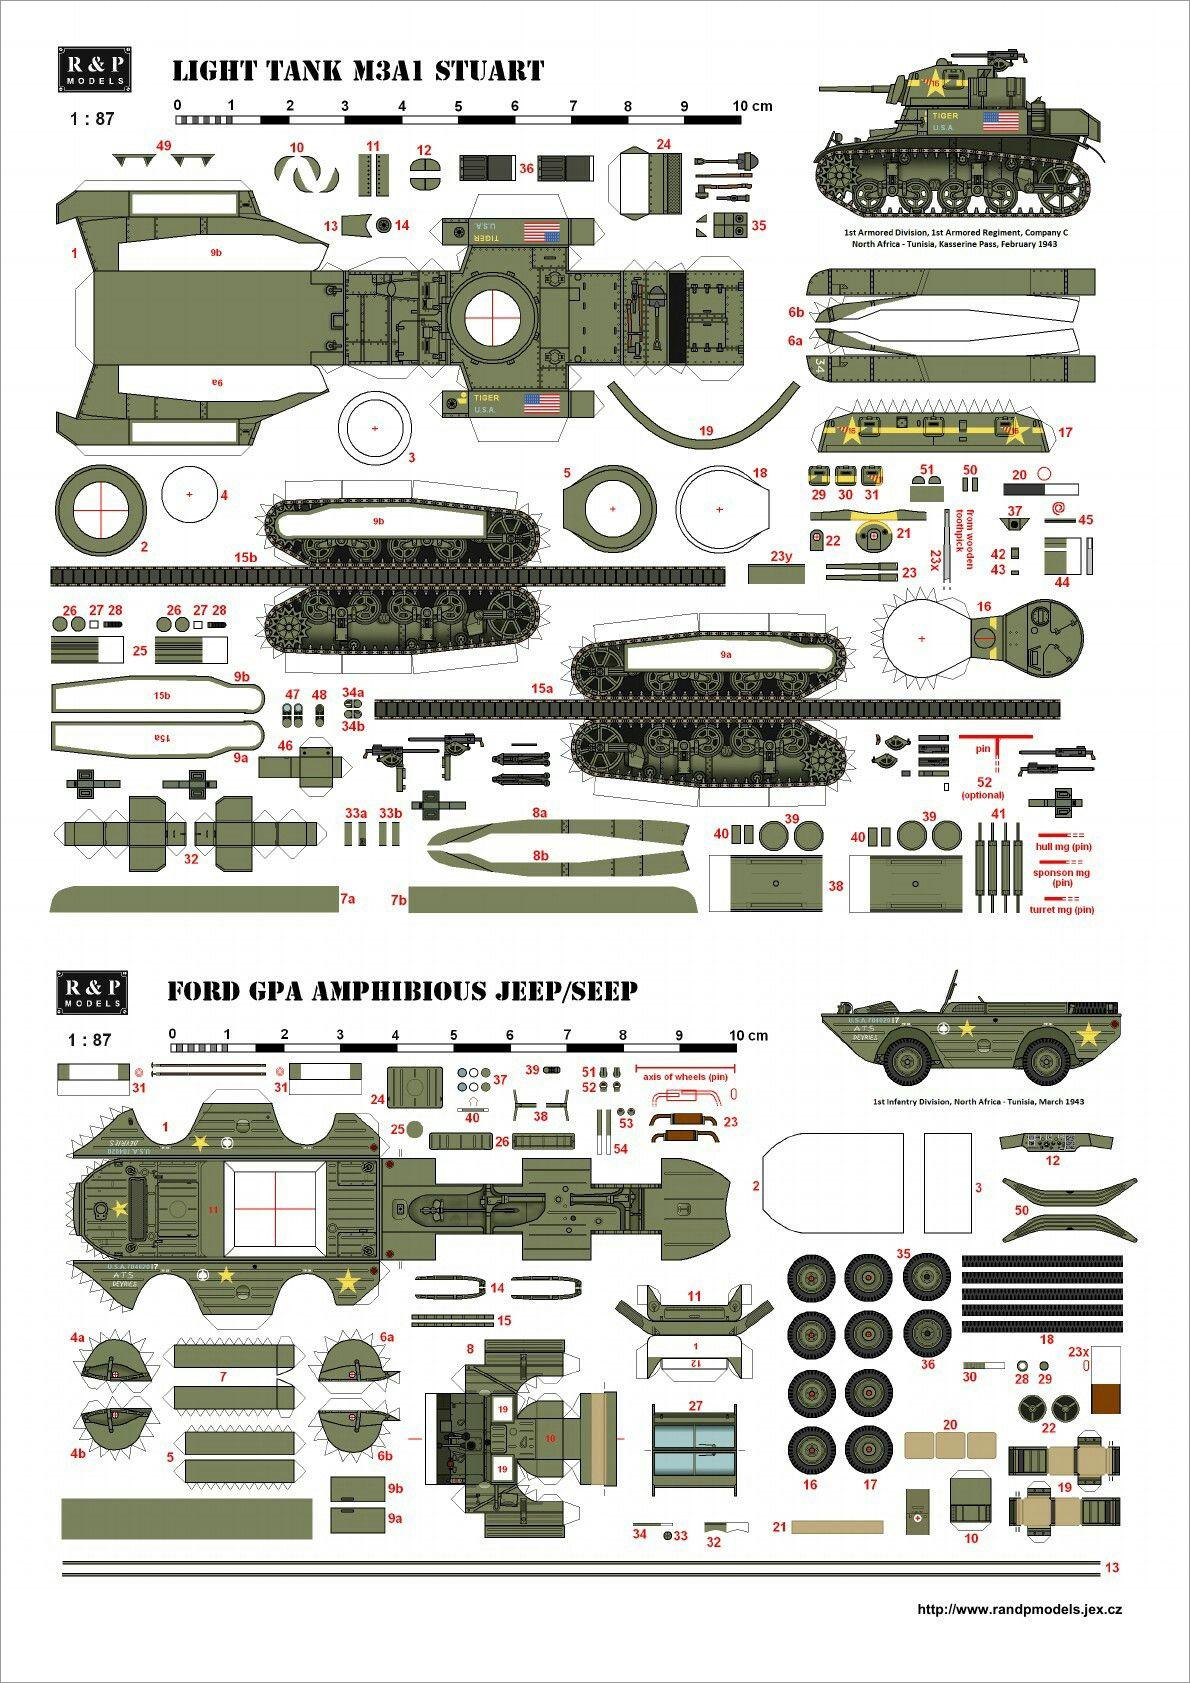 Papercraft Tank Light Tank M3a1 Stuart Papercraft